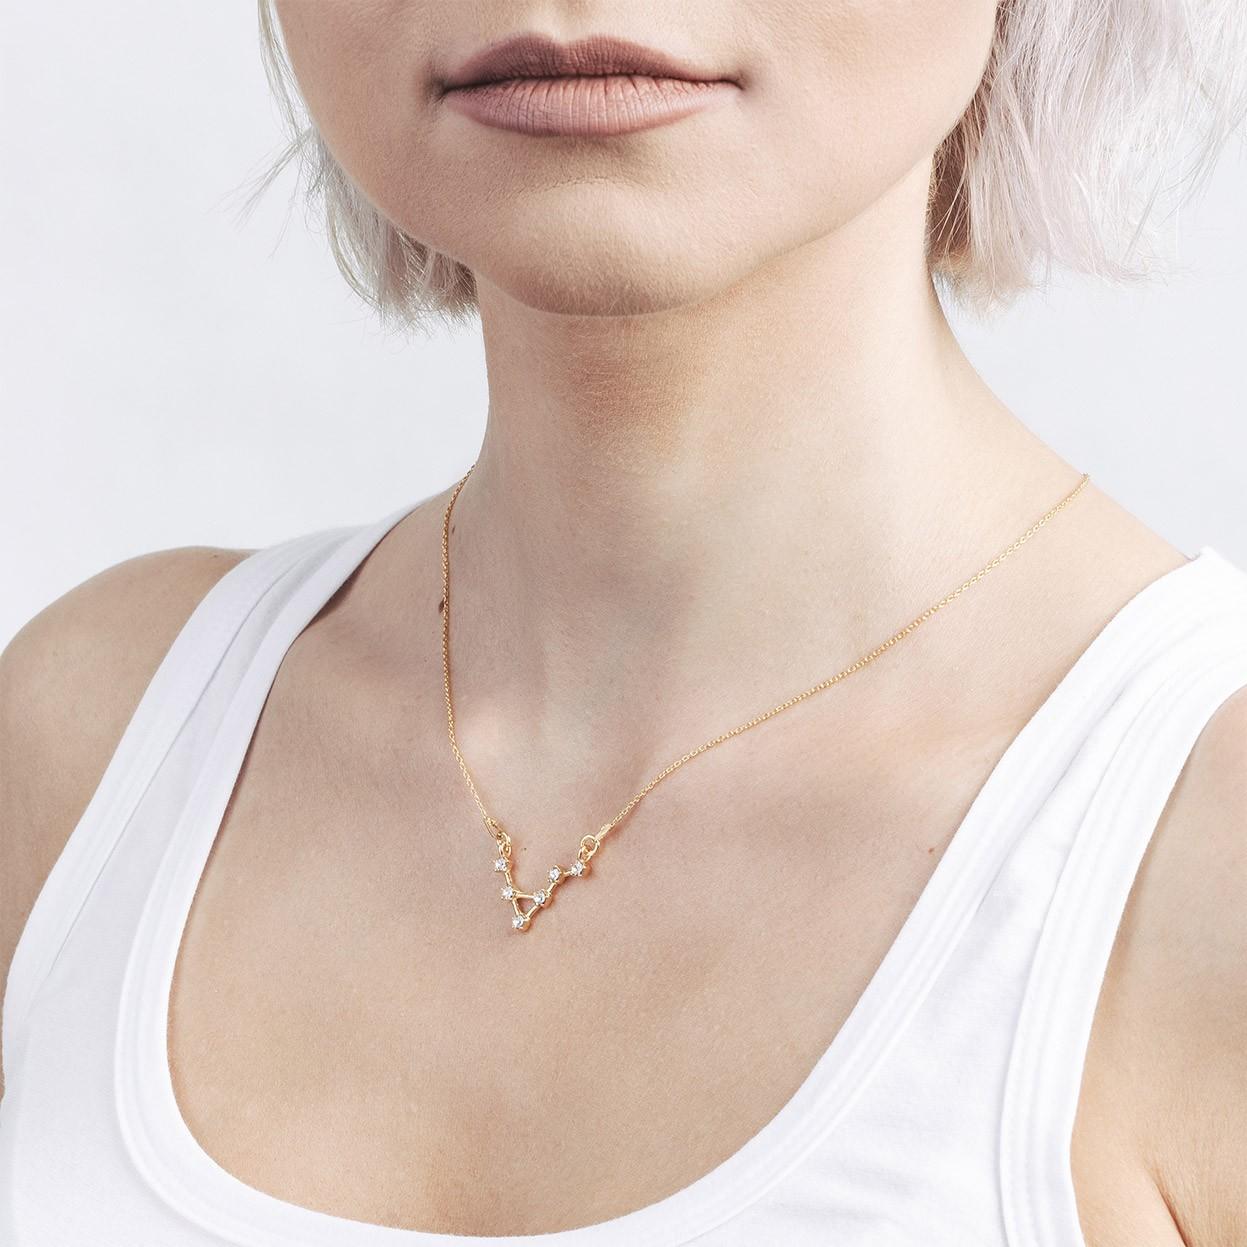 LIBRA zodiac sign necklace with Swarovski Crystals silver 925